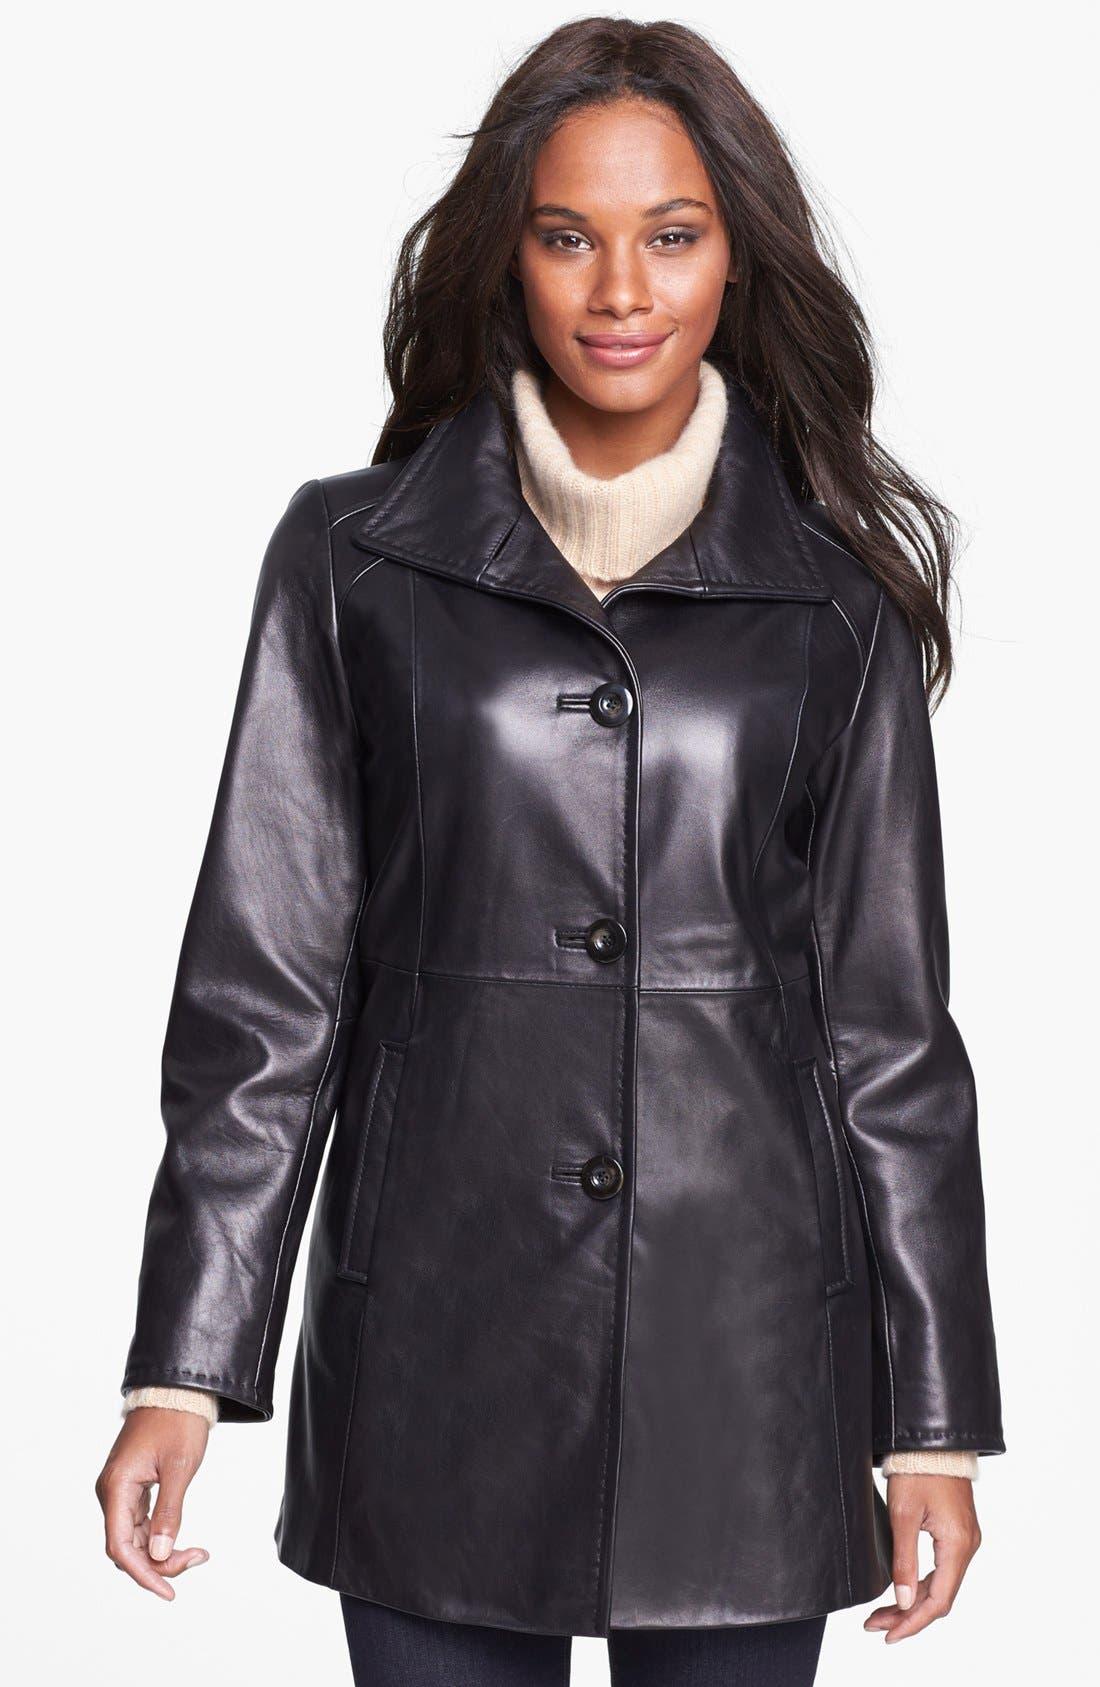 Alternate Image 1 Selected - Ellen Tracy Leather Car Coat (Petite)